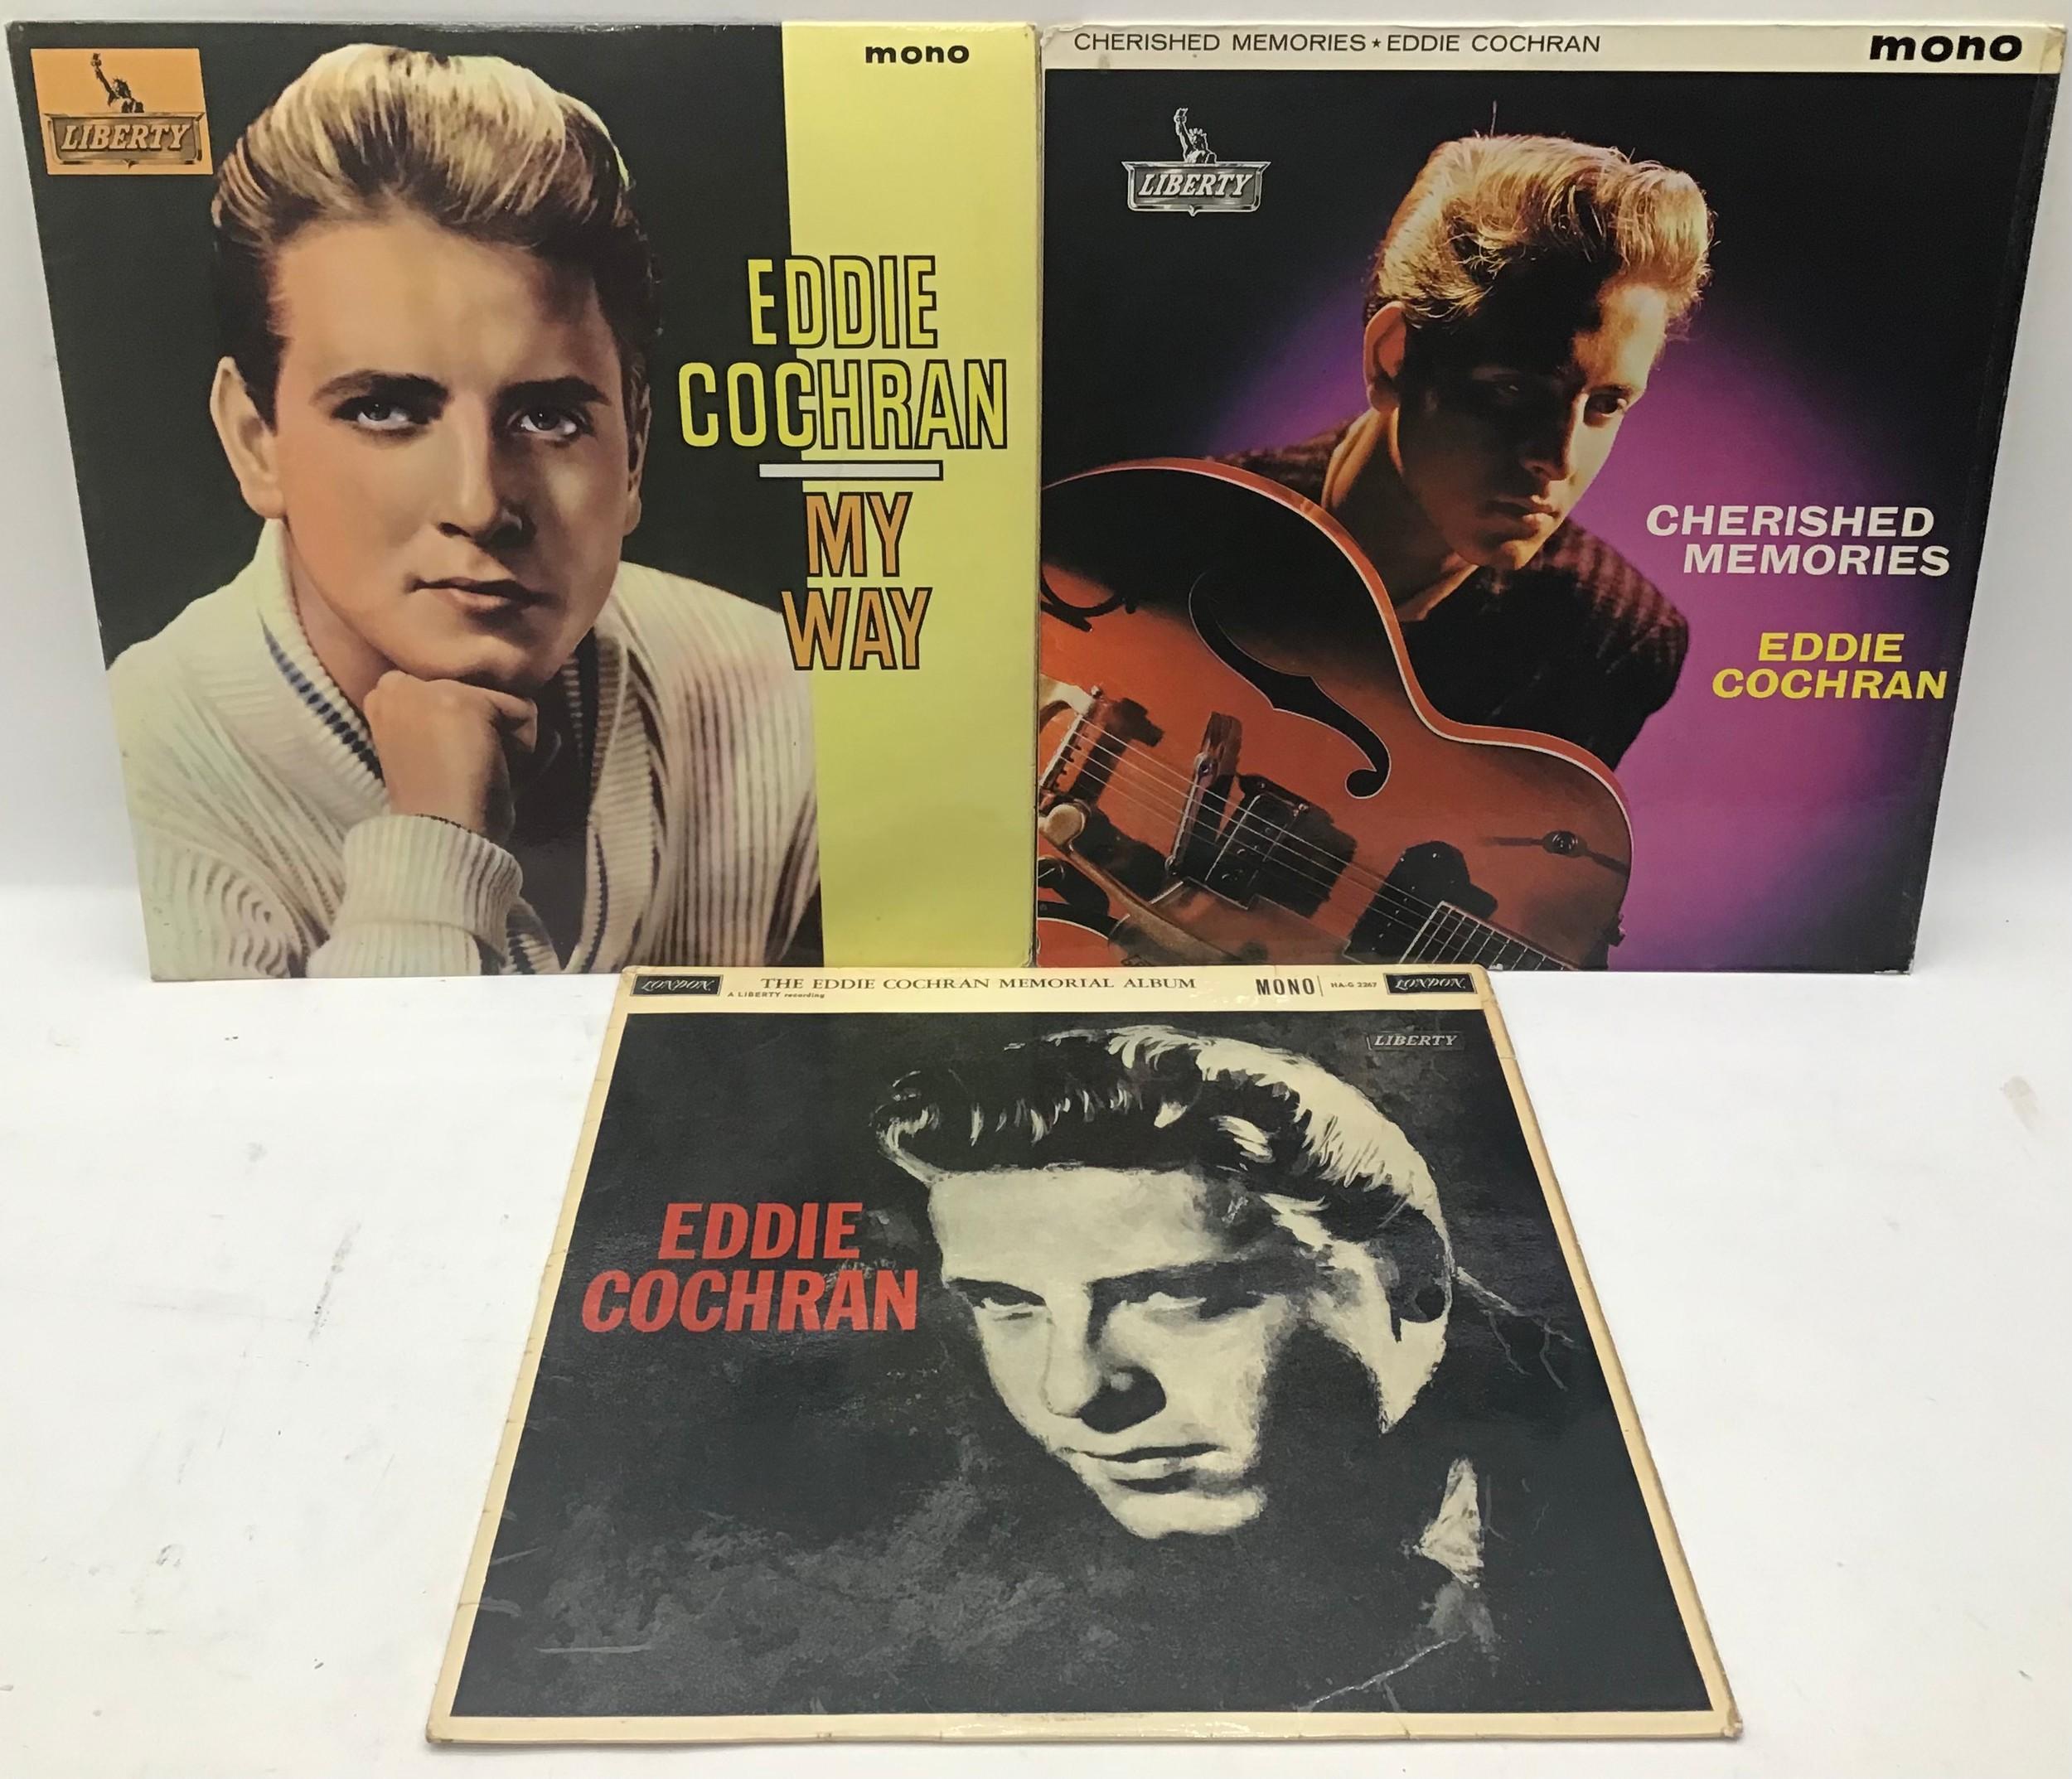 3 EDDIE COCHRAN original vinyl LP records. Album titles as follows : My Way - Cherished Memories and